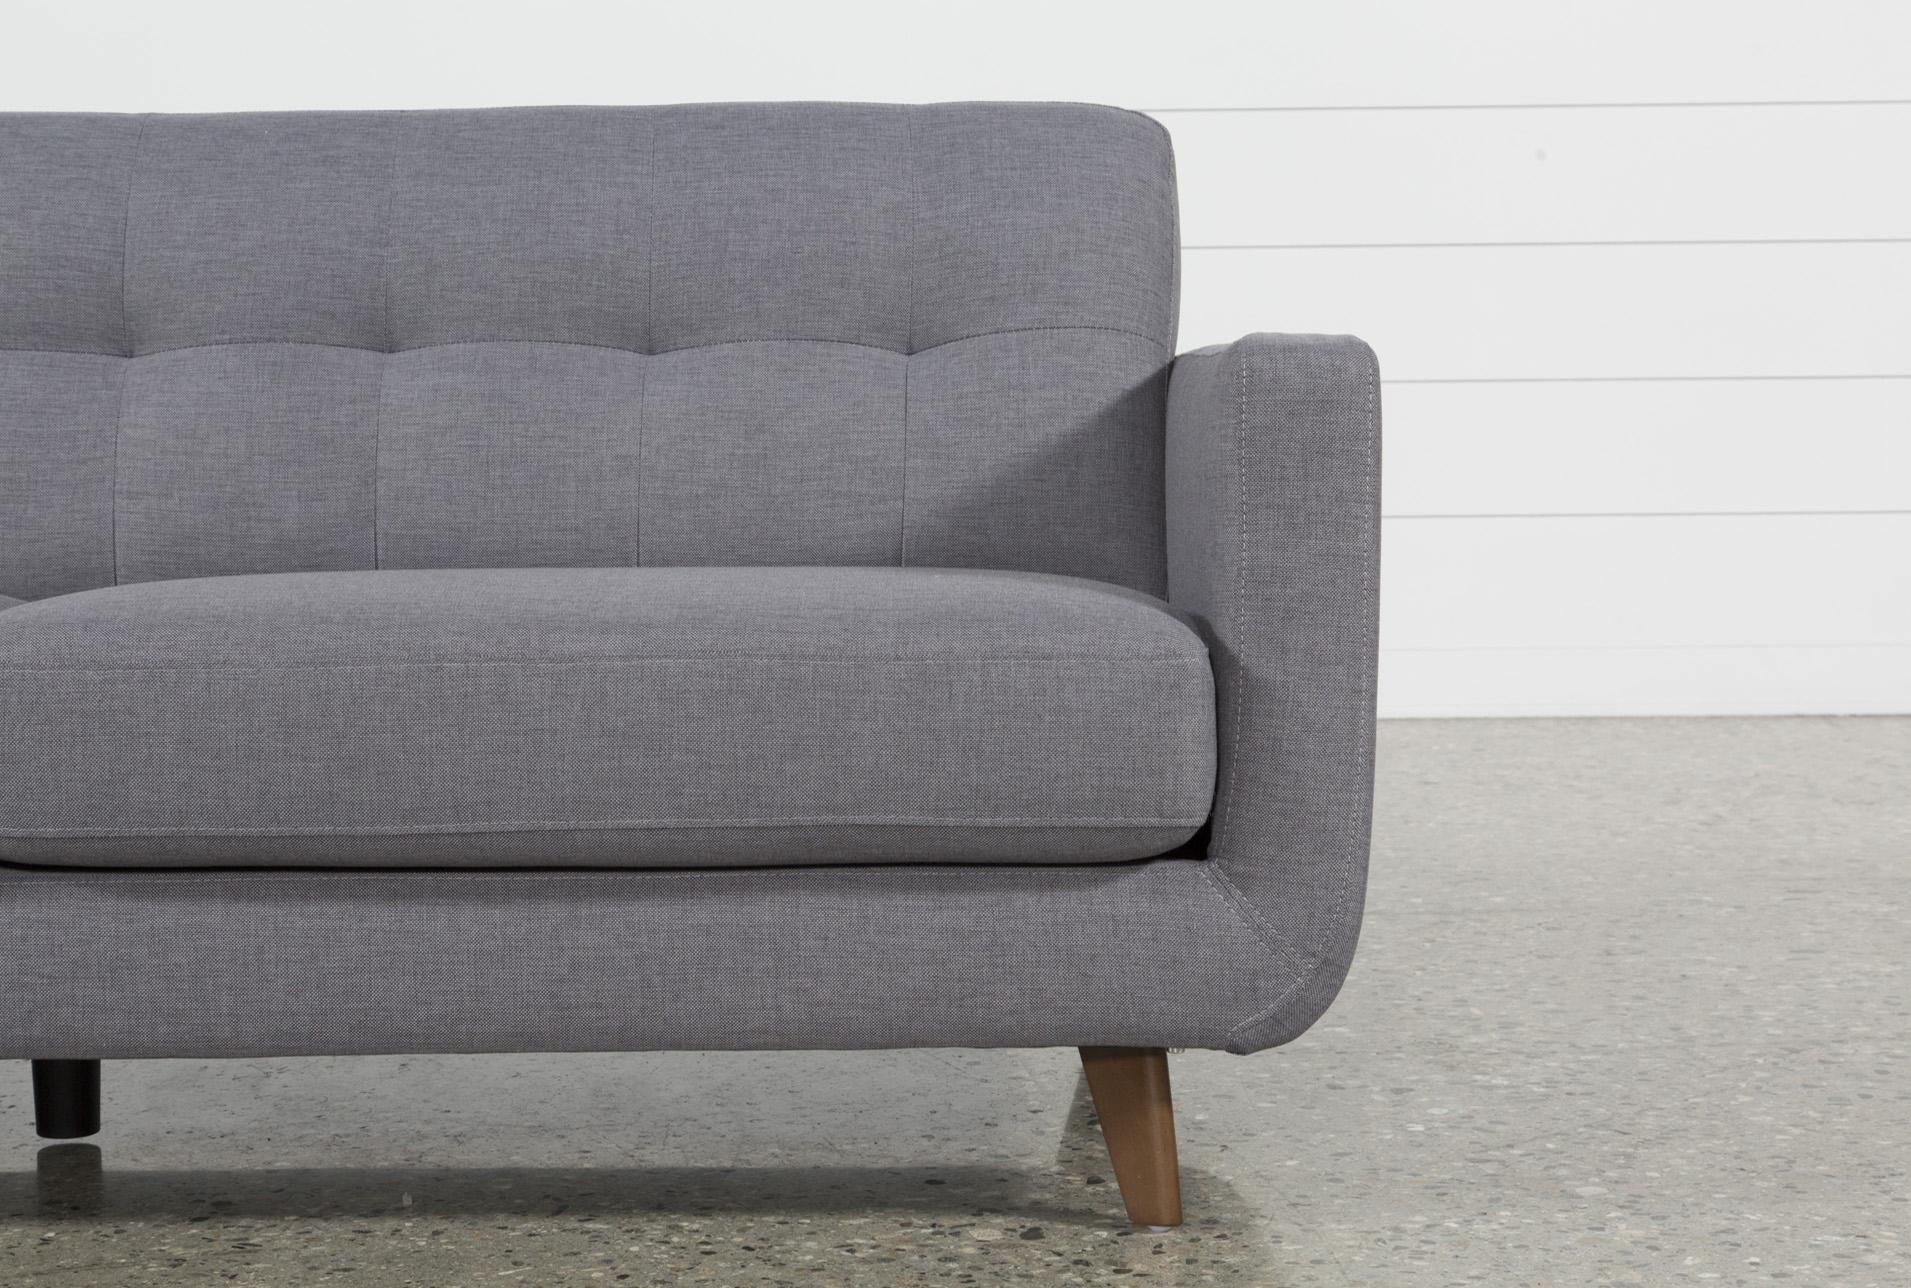 Allie Dark Grey Sofa | Dark Grey And Products In Allie Dark Grey Sofa Chairs (View 5 of 25)